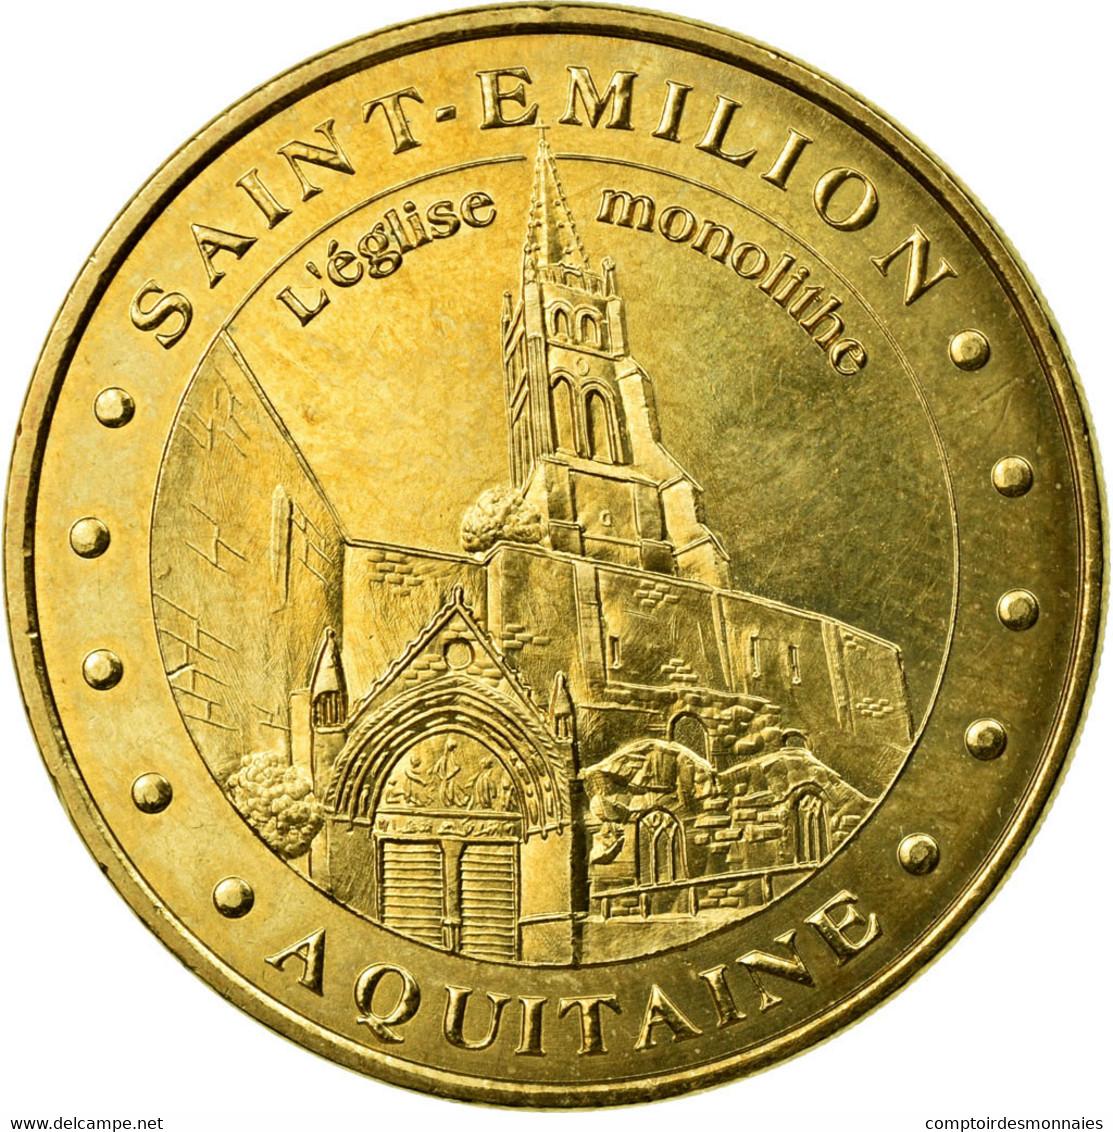 France, Jeton, 33/ Saint-Emilion - Eglise, 2010, MDP, SUP, Cupro-nickel - France